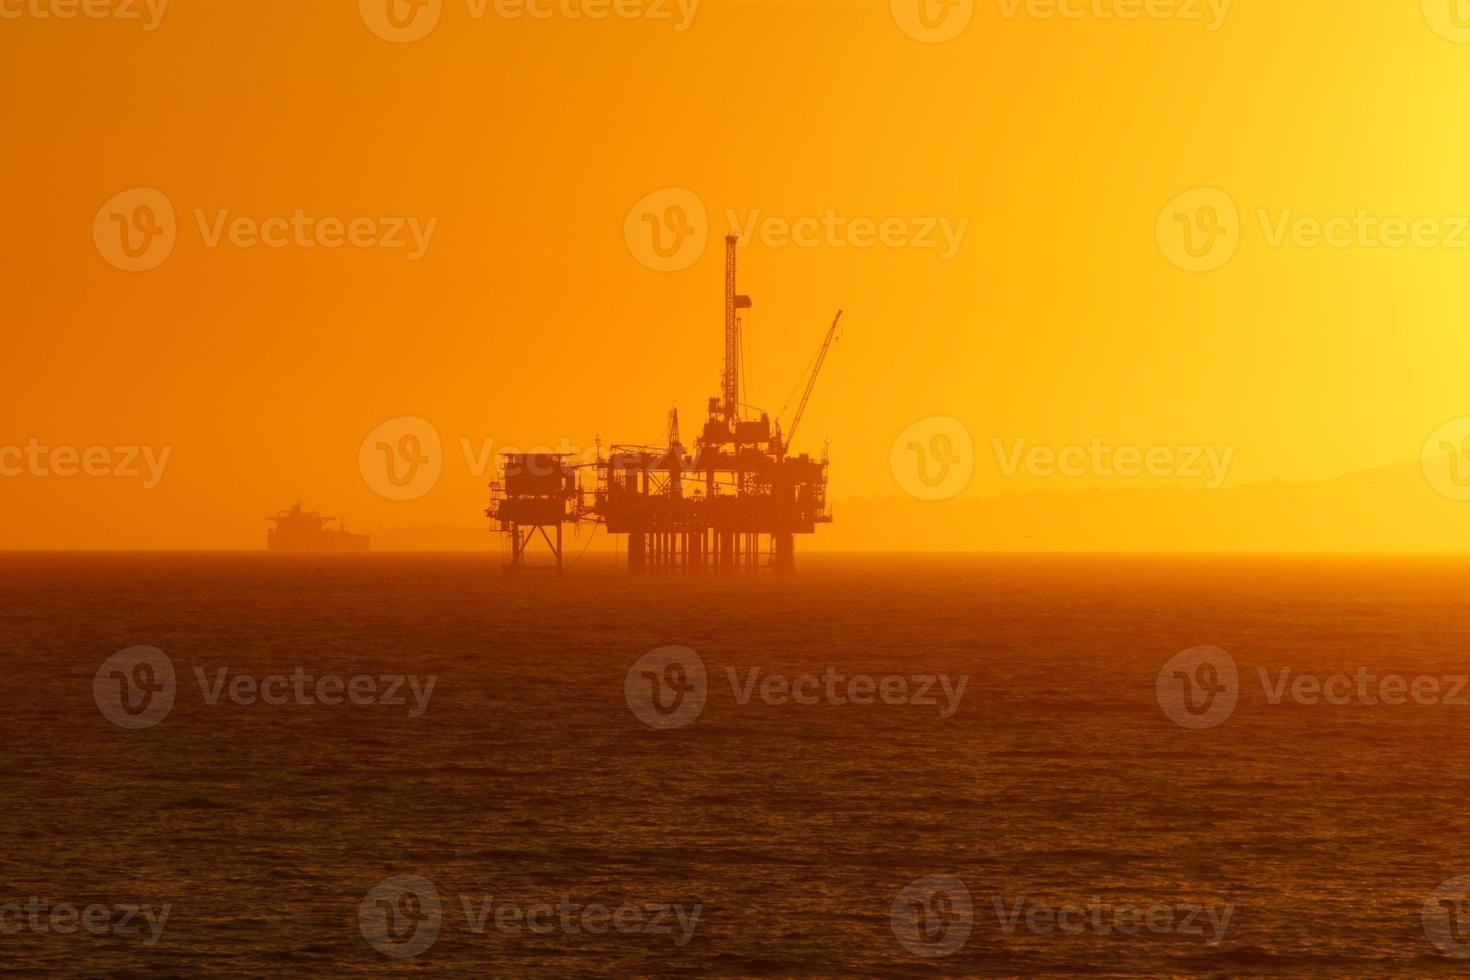 plataforma de petróleo de praia ao pôr do sol foto